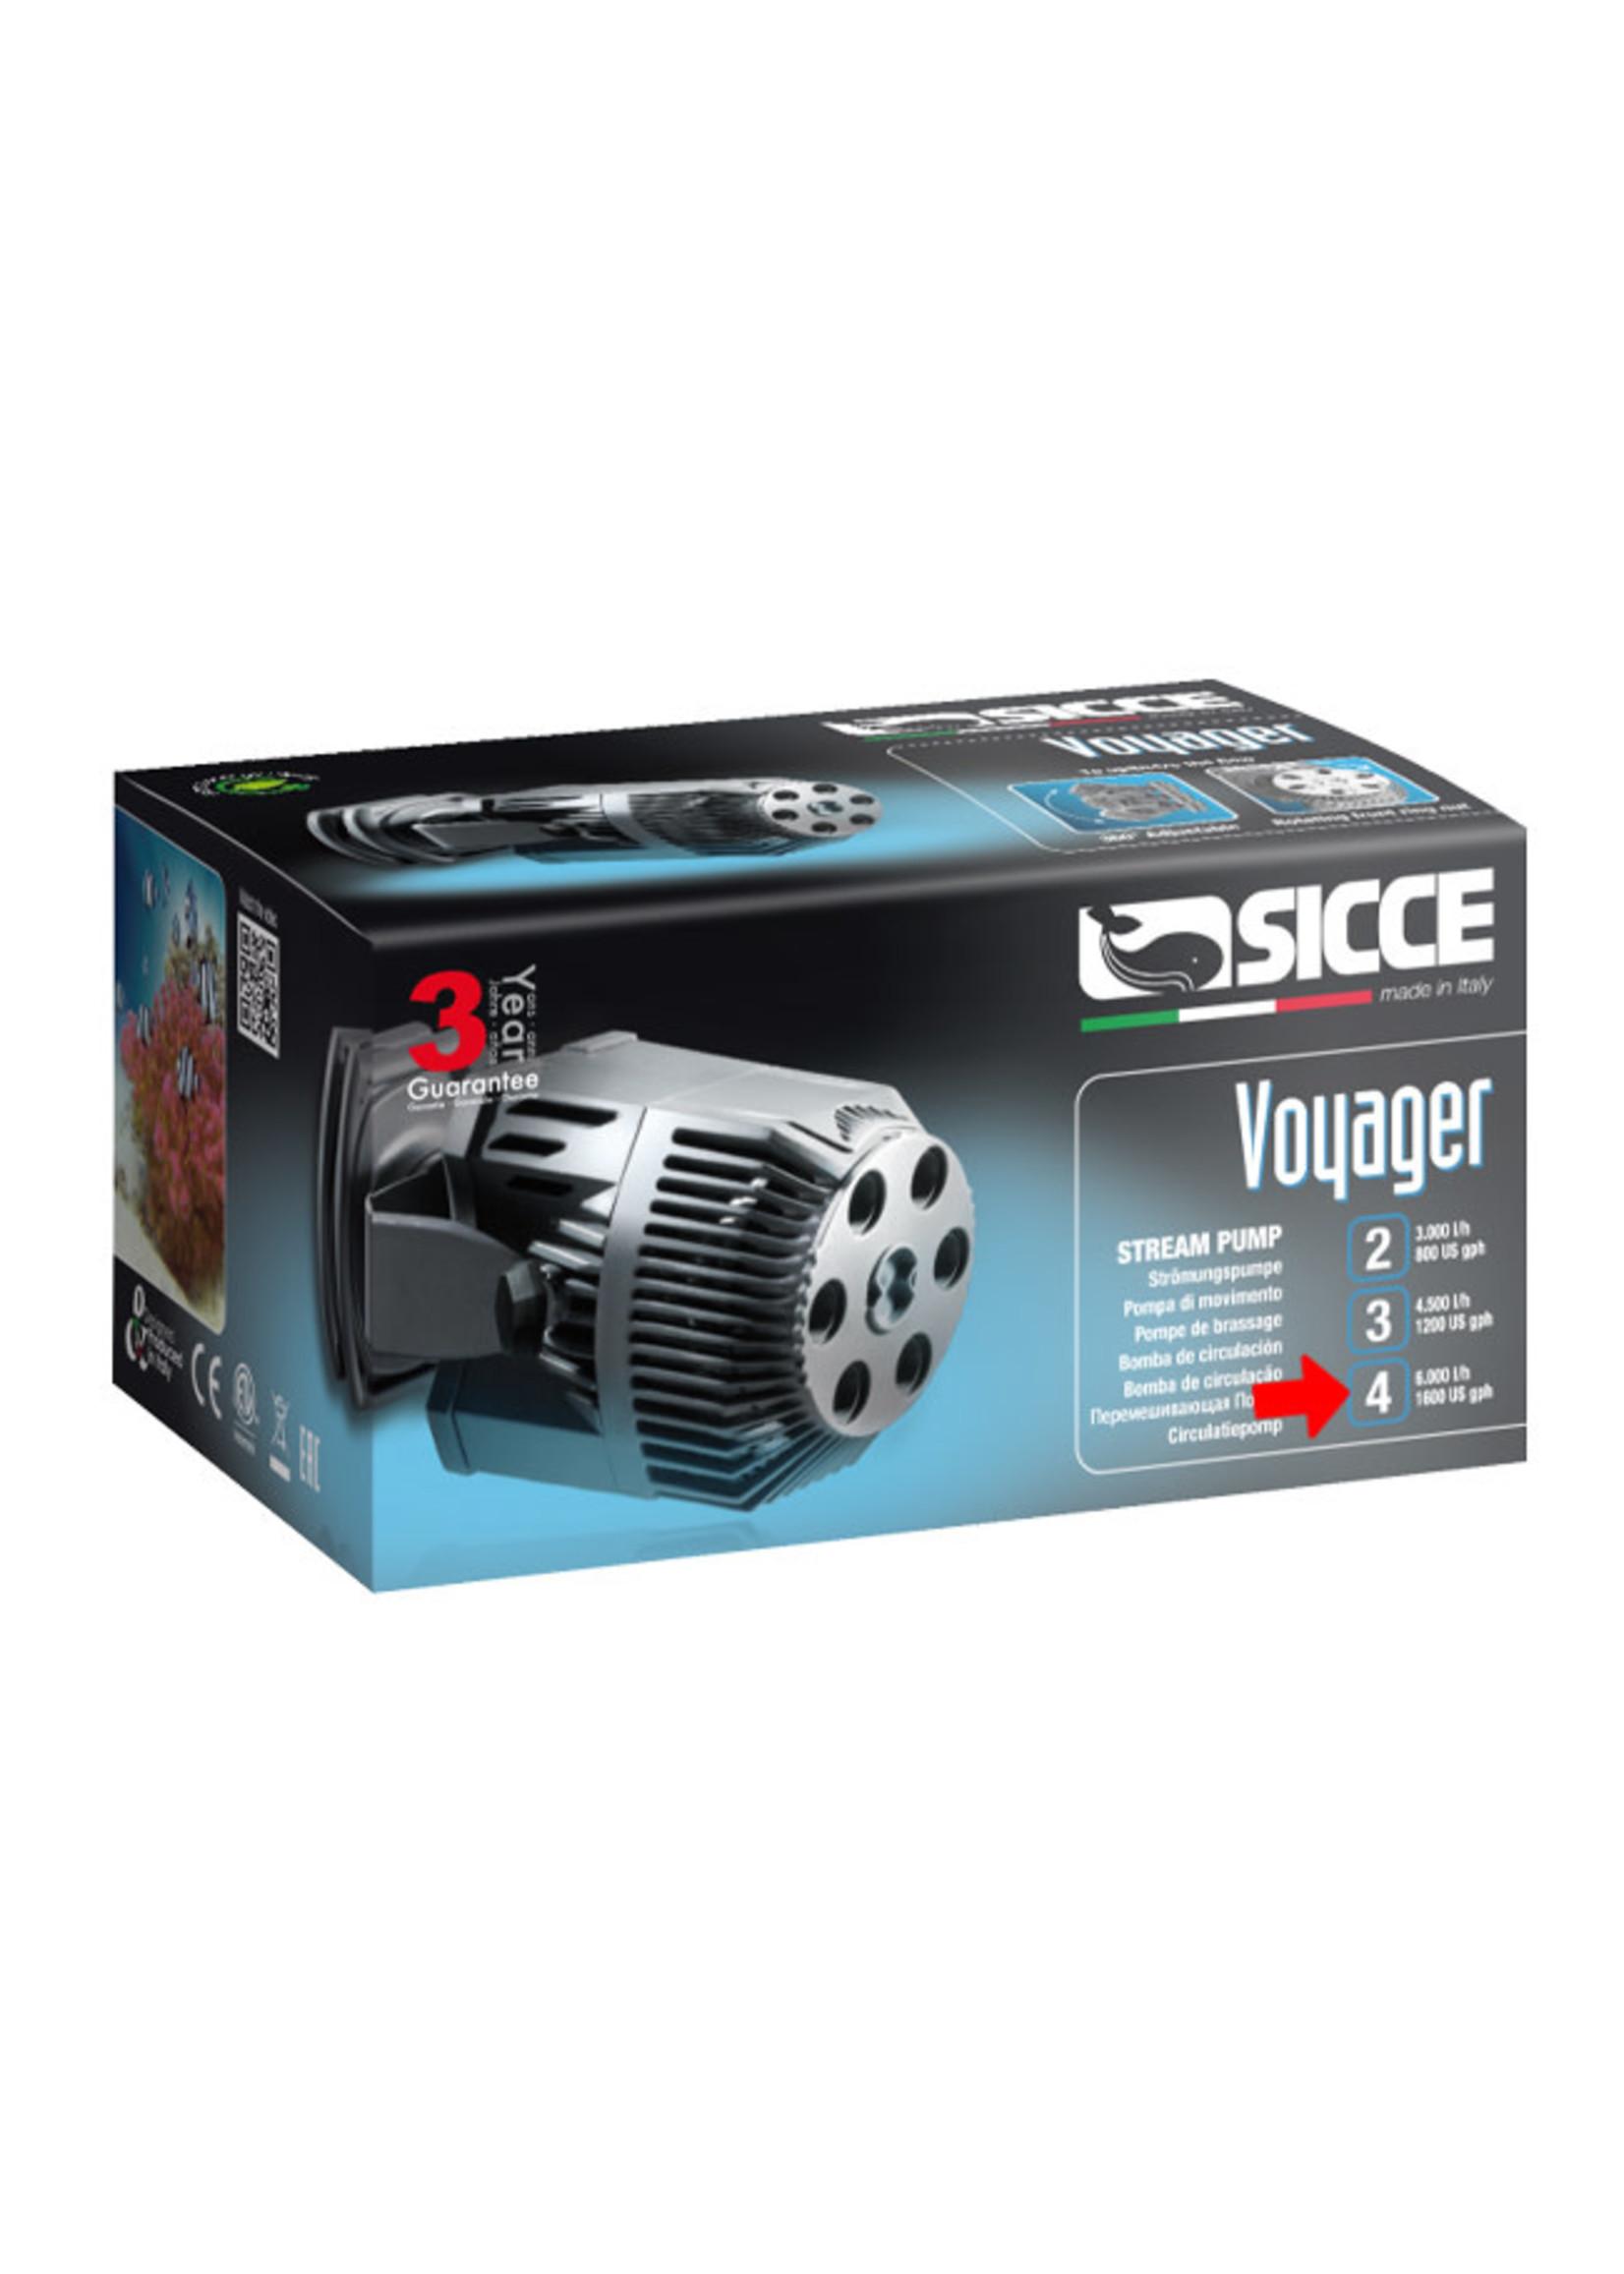 SICCE US, Inc. Sicce Voyager Stream Pump 4, 1600gph